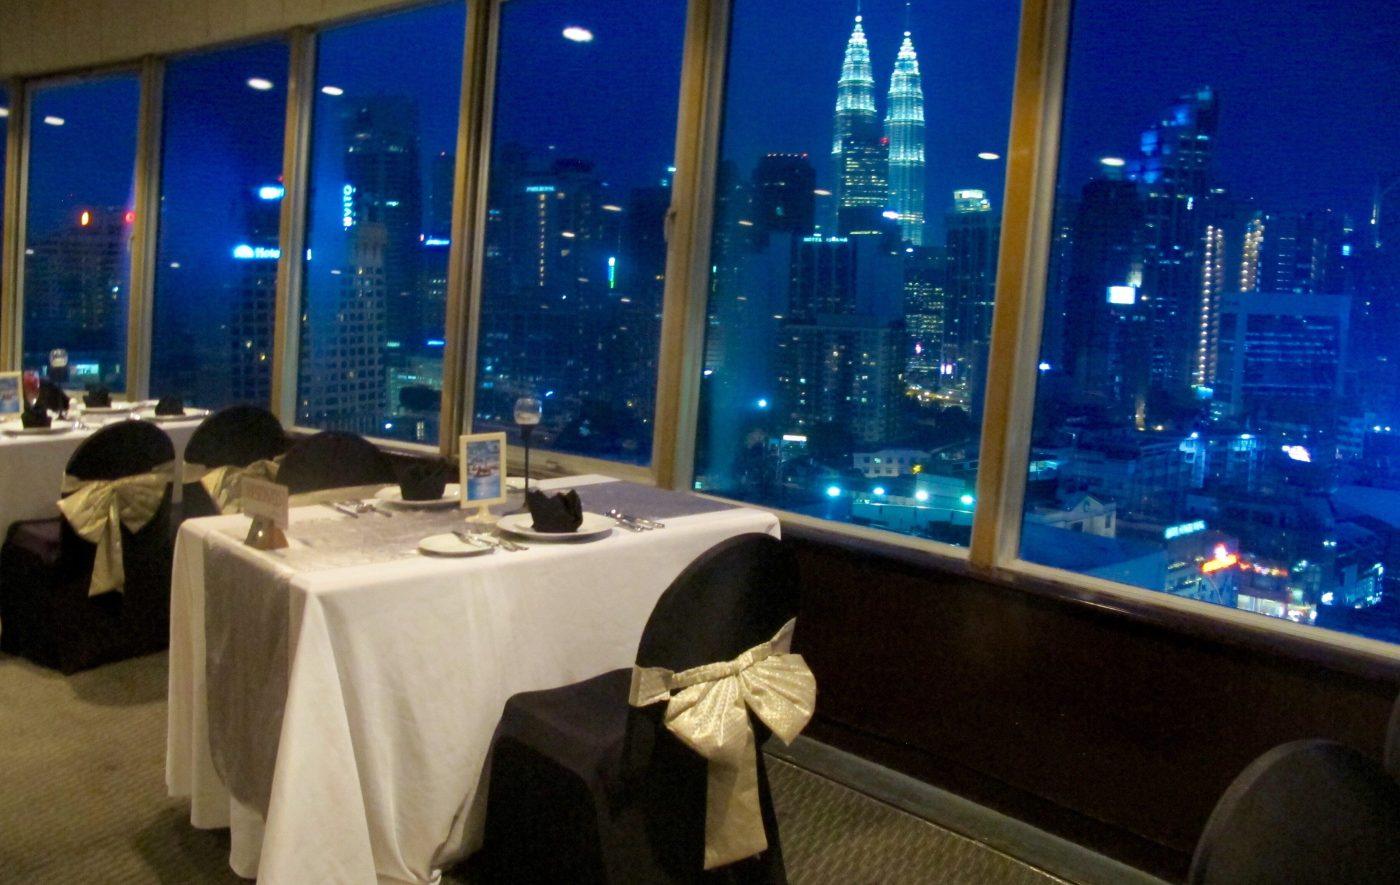 Bintang Revolving Restaurant Federal Hotel KL